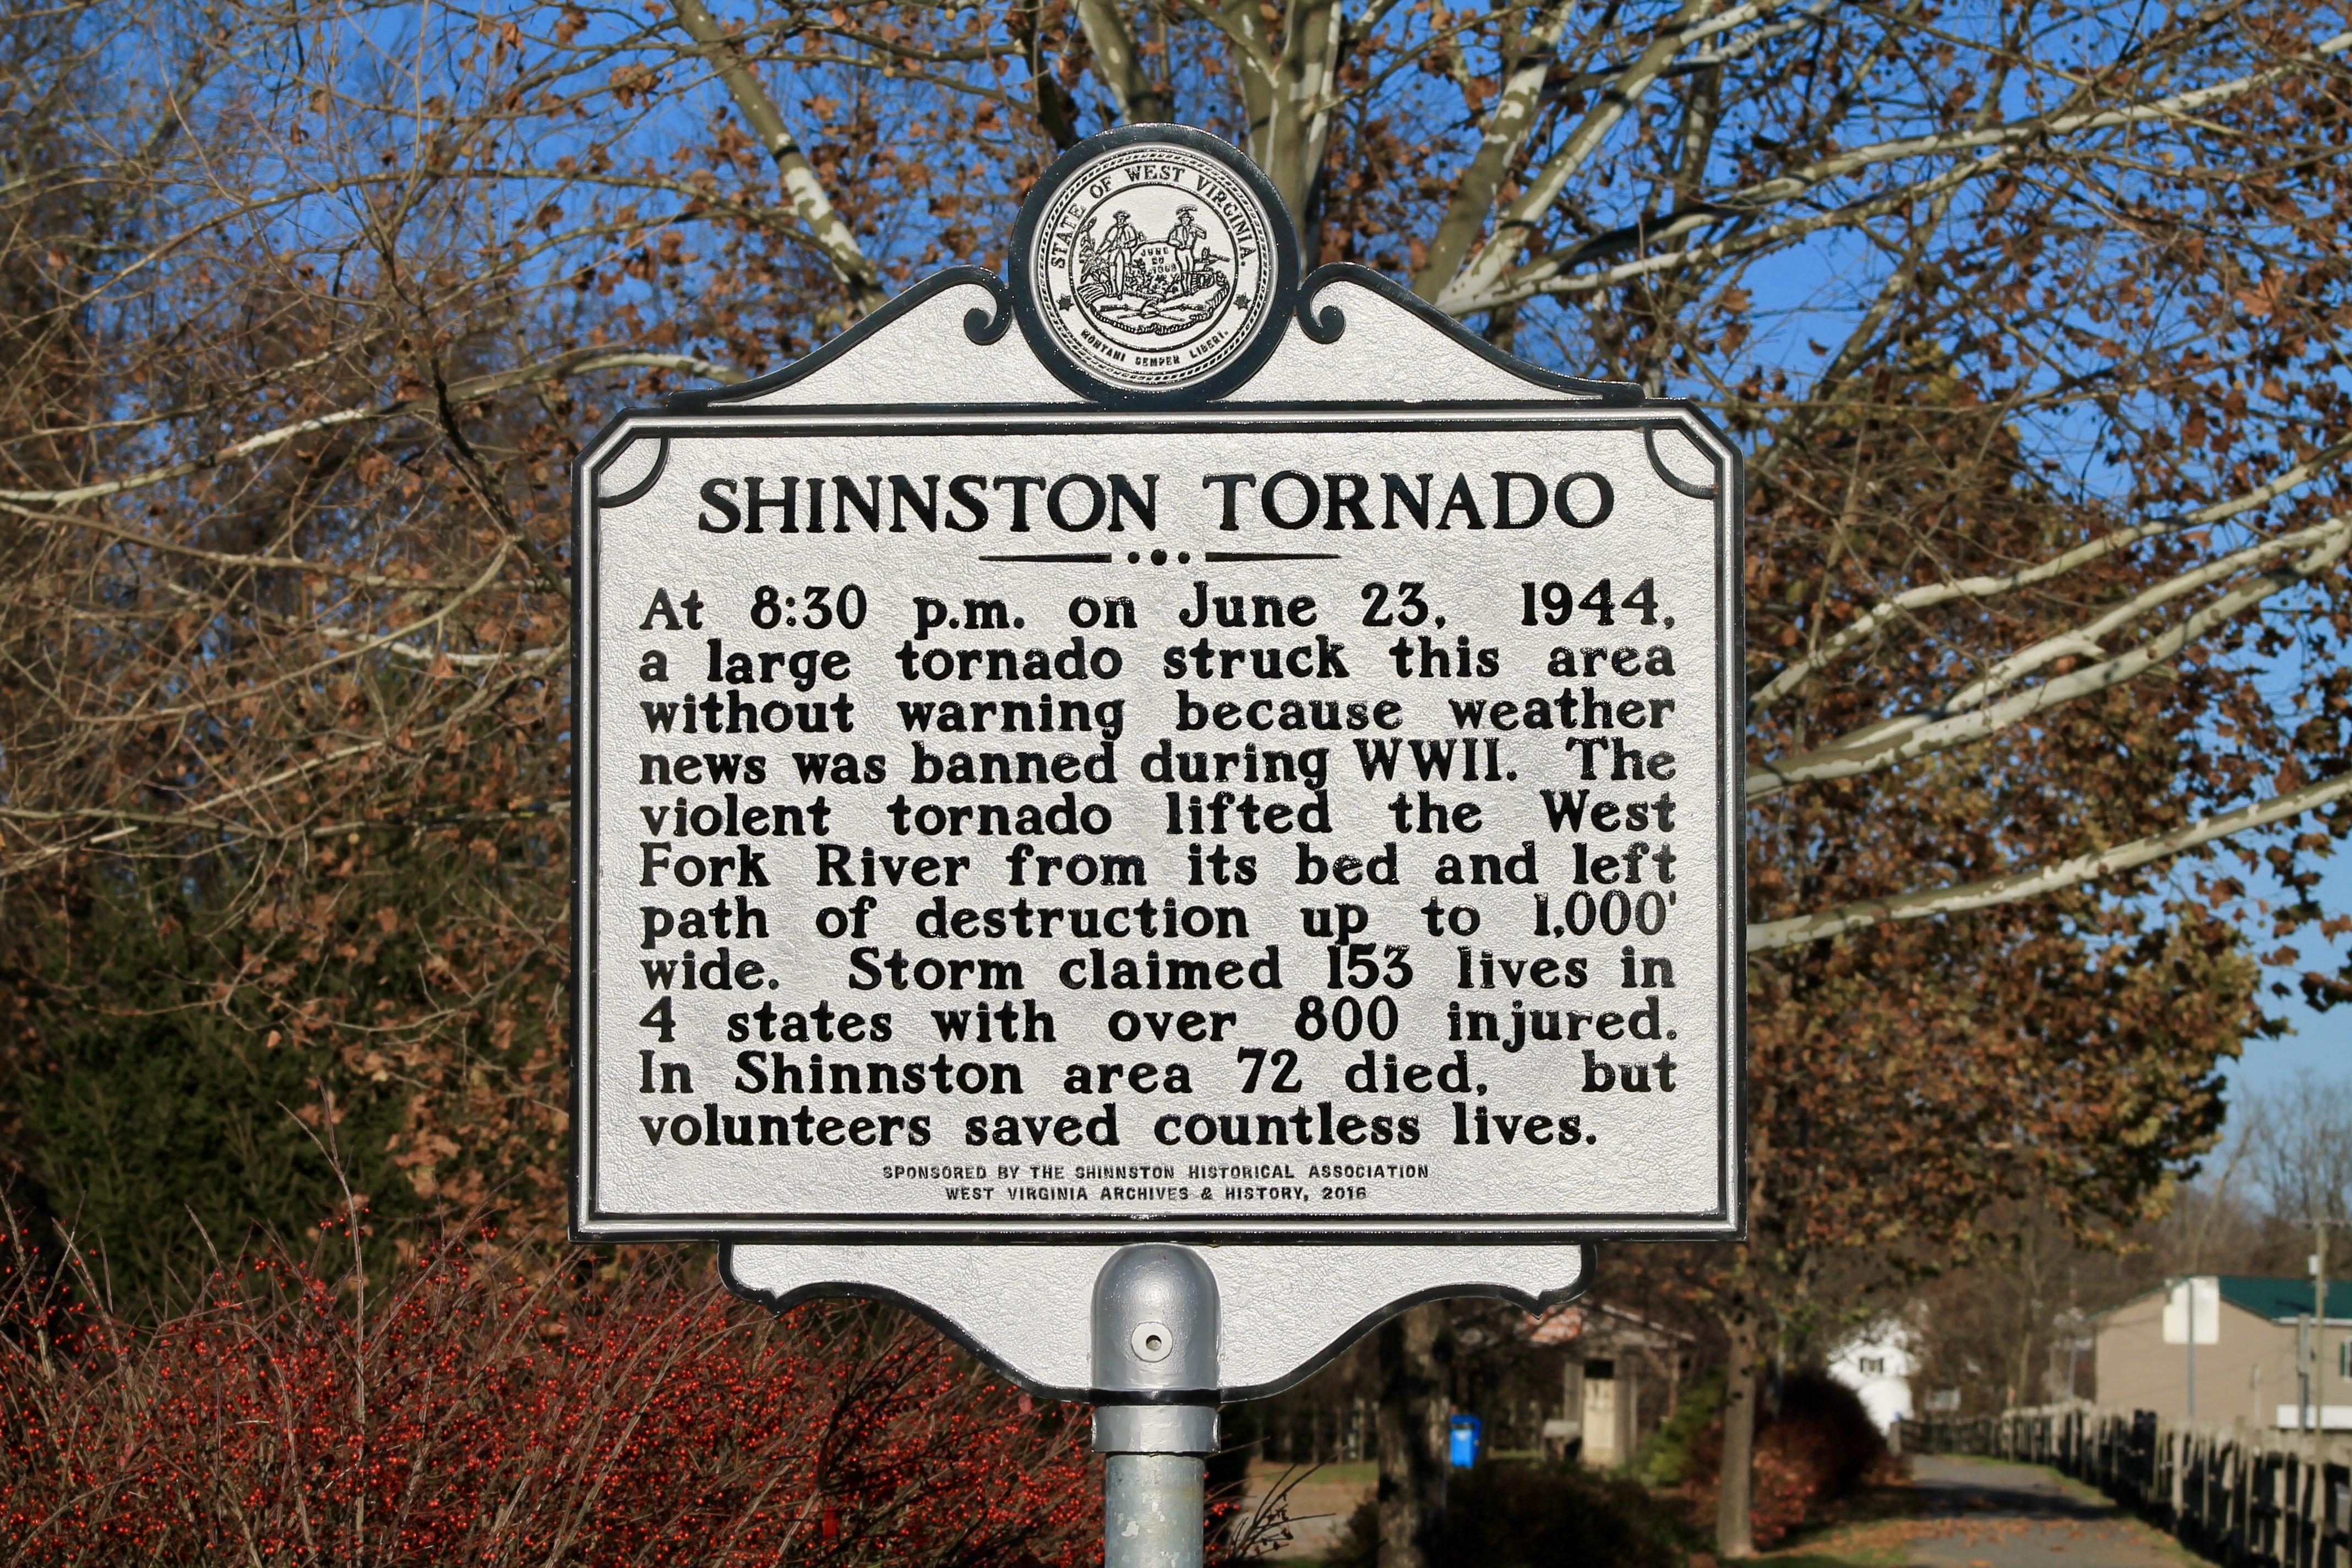 Shinnston Tornado historical marker - Shinnston, WV